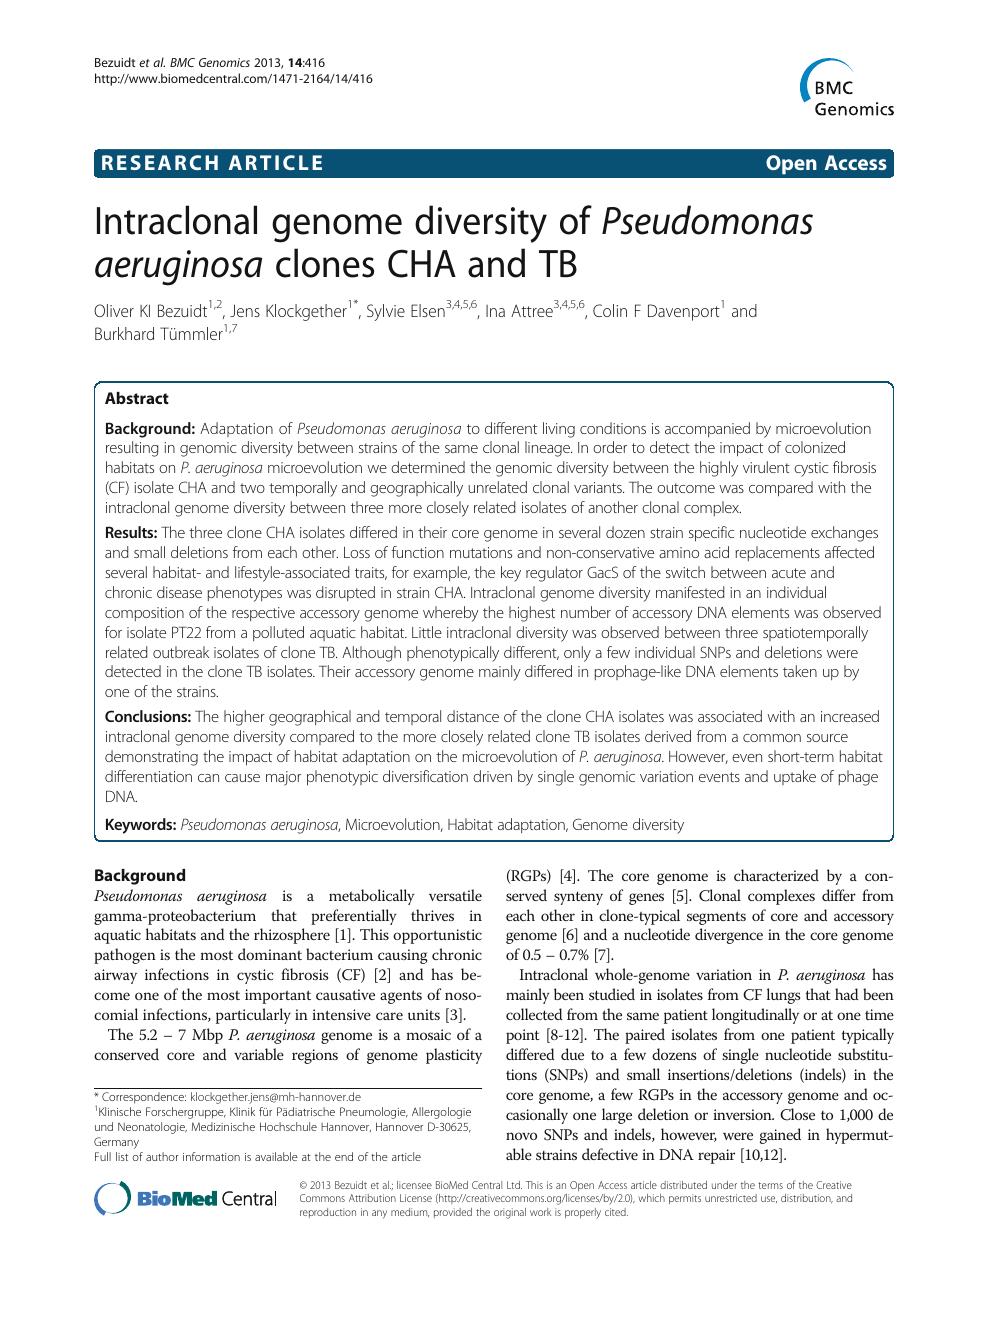 Intraclonal genome diversity of Pseudomonas aeruginosa clones CHA